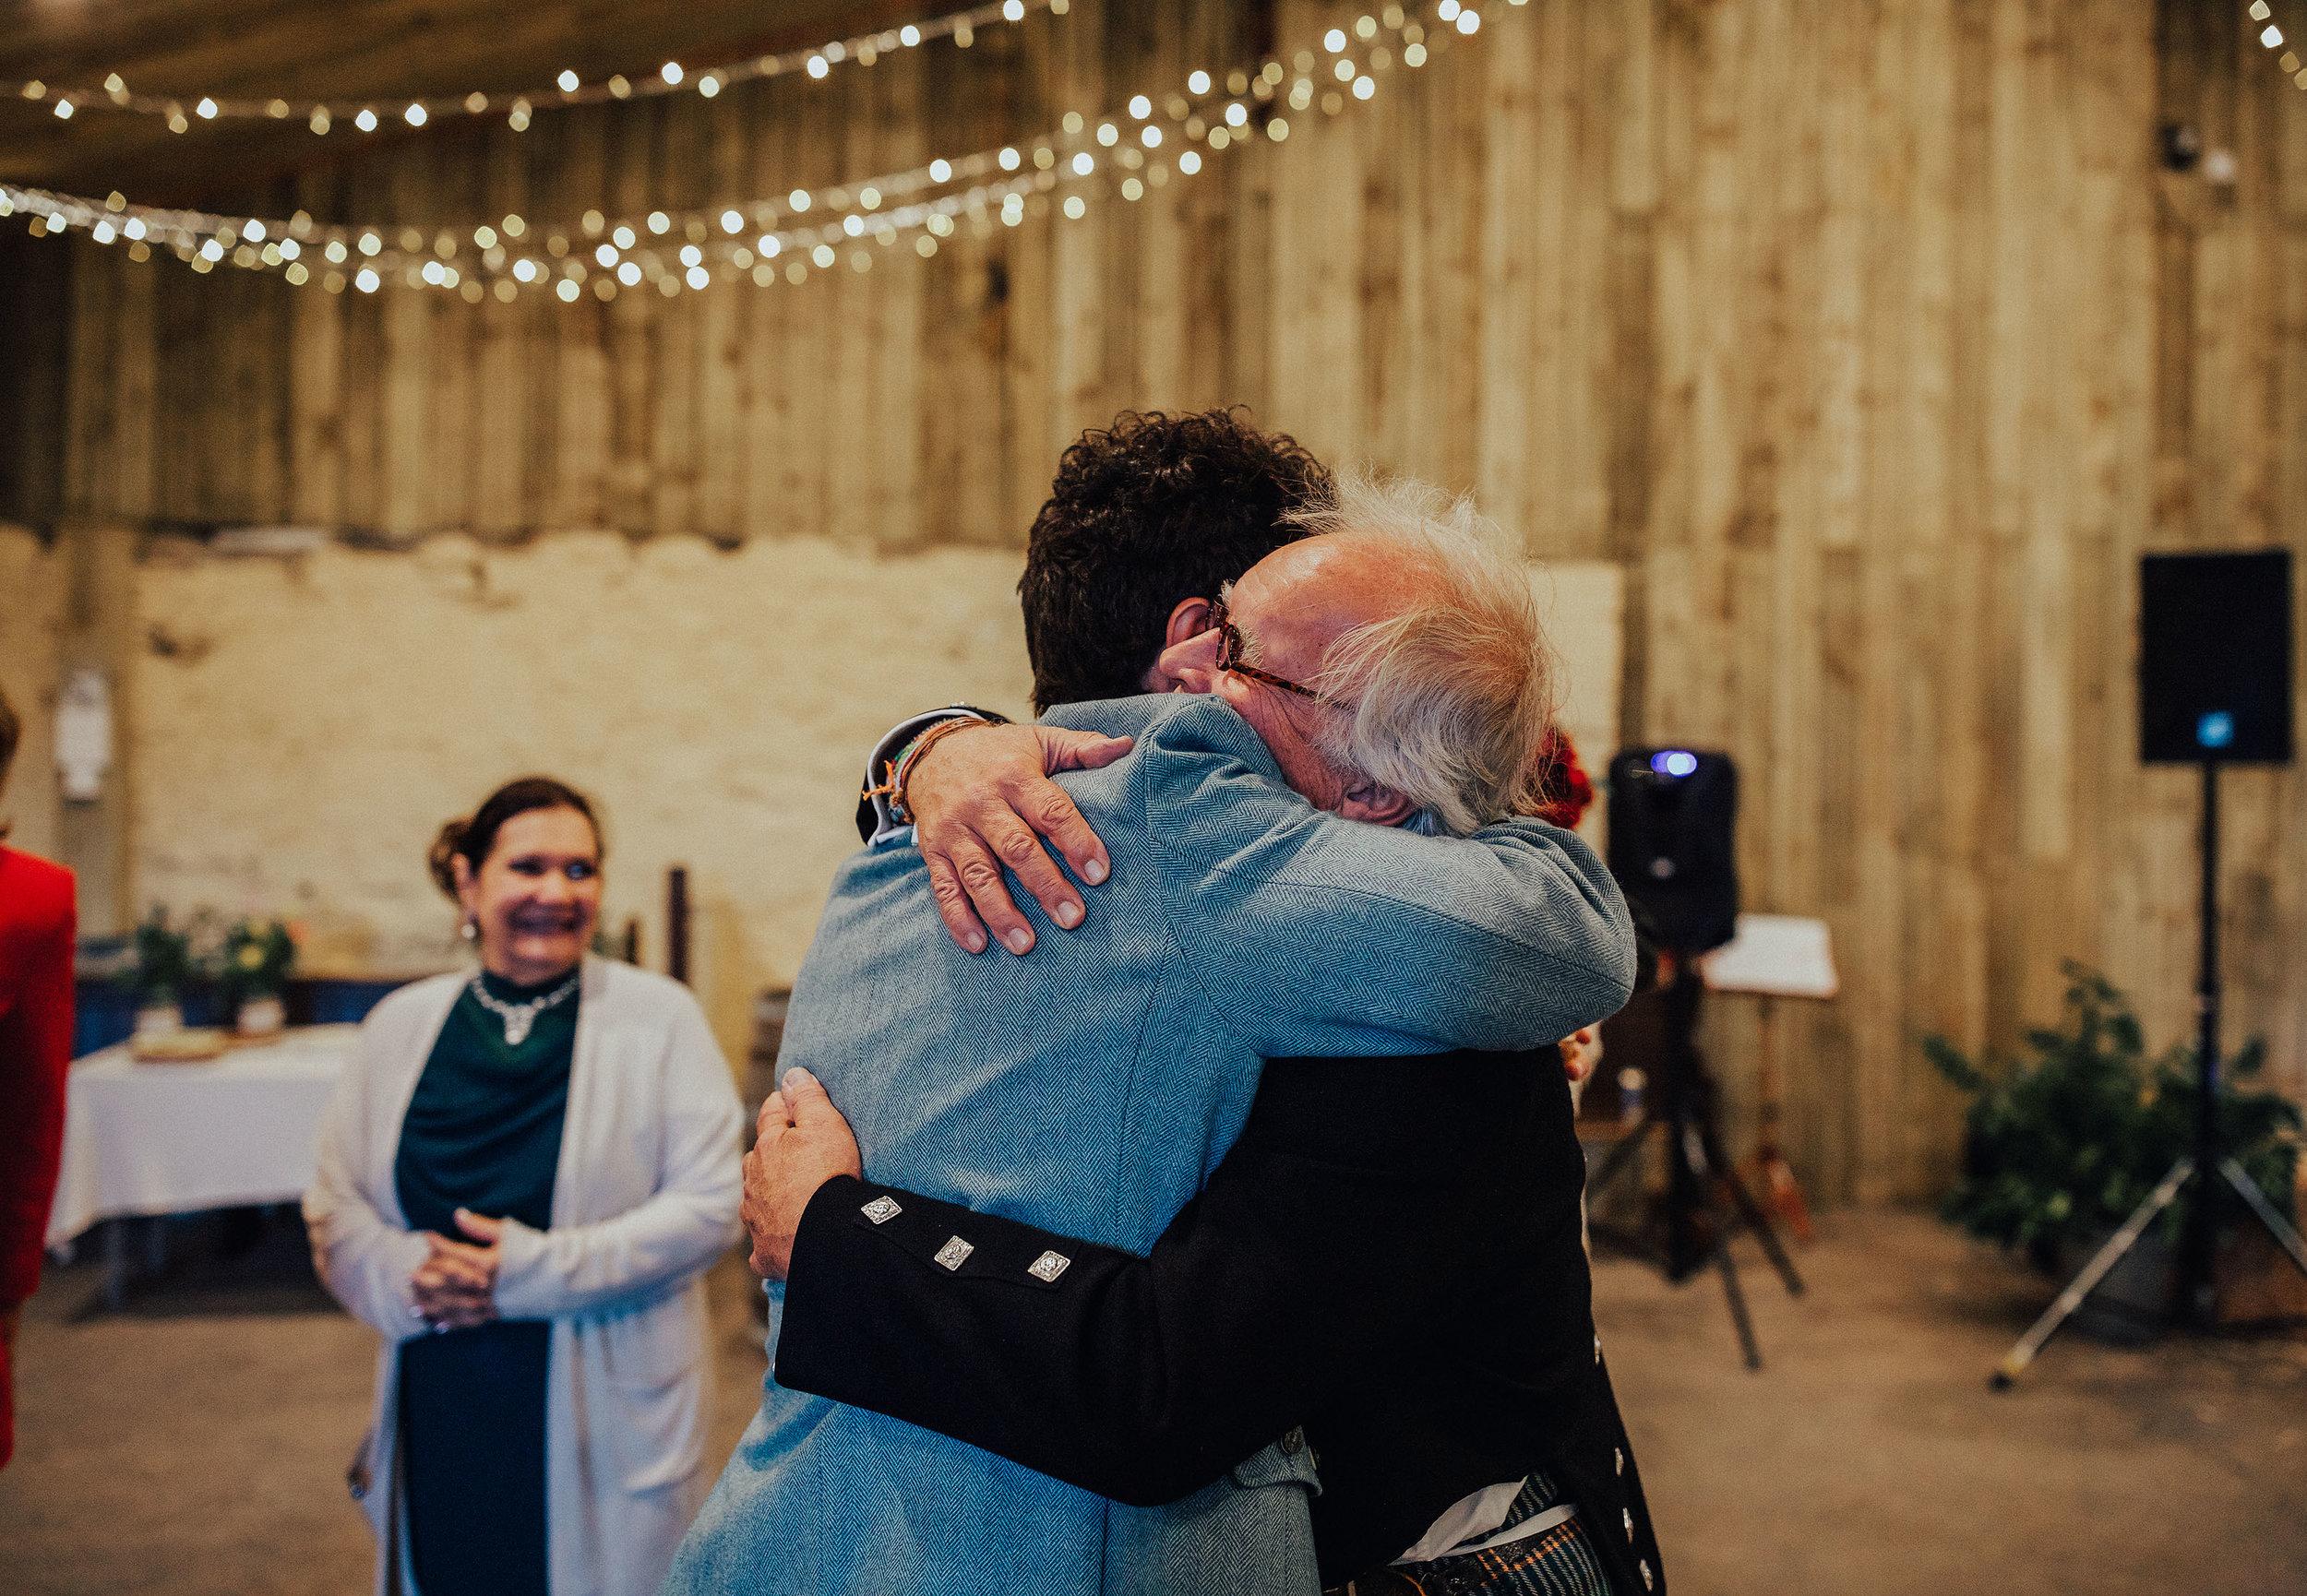 COMRIE_CROFT_WEDDINGS_PJ_PHILLIPS_PHOTOGRAPHY_166.jpg